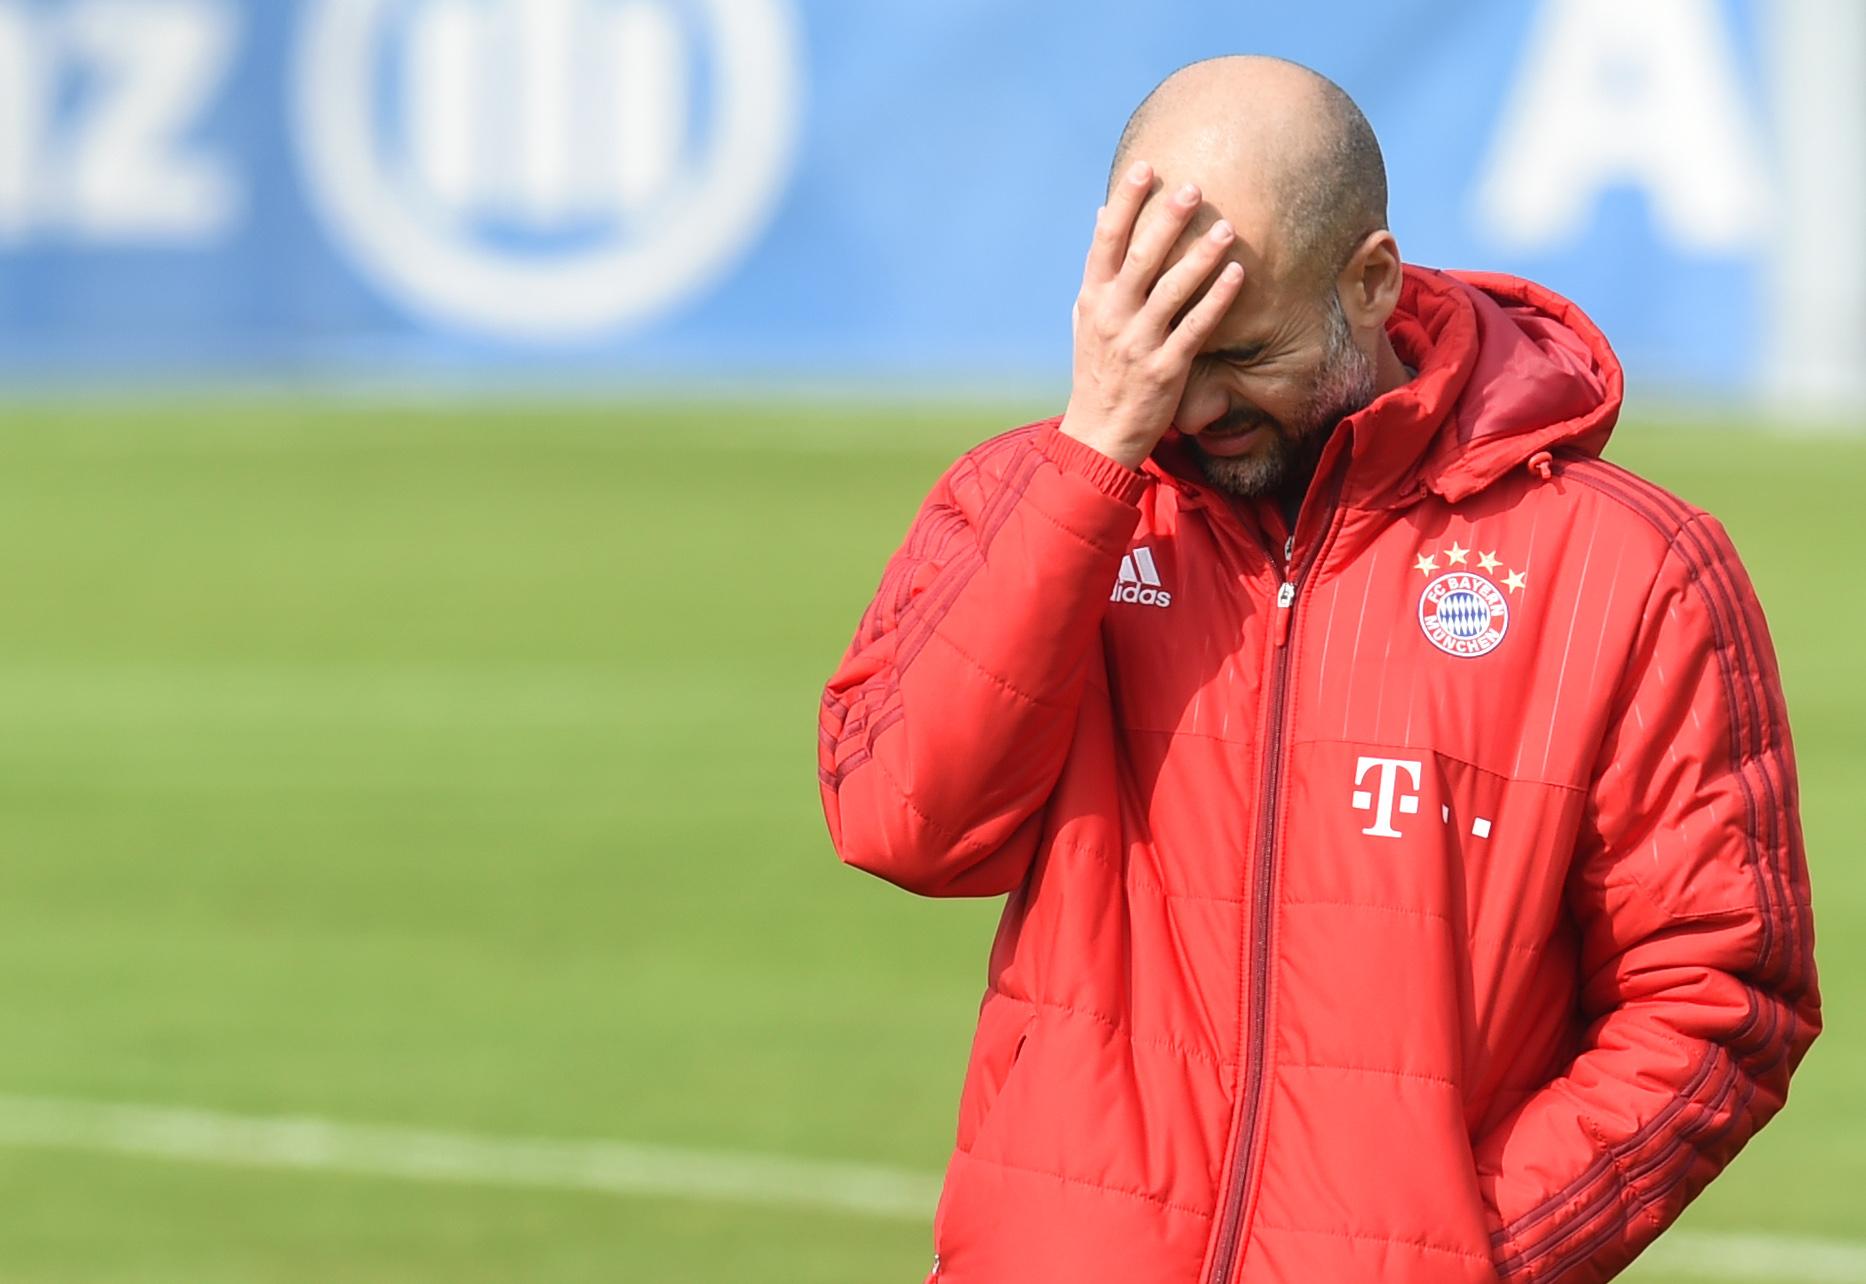 Pep Guardiola to return to Bayern Munich for pre-season friendly